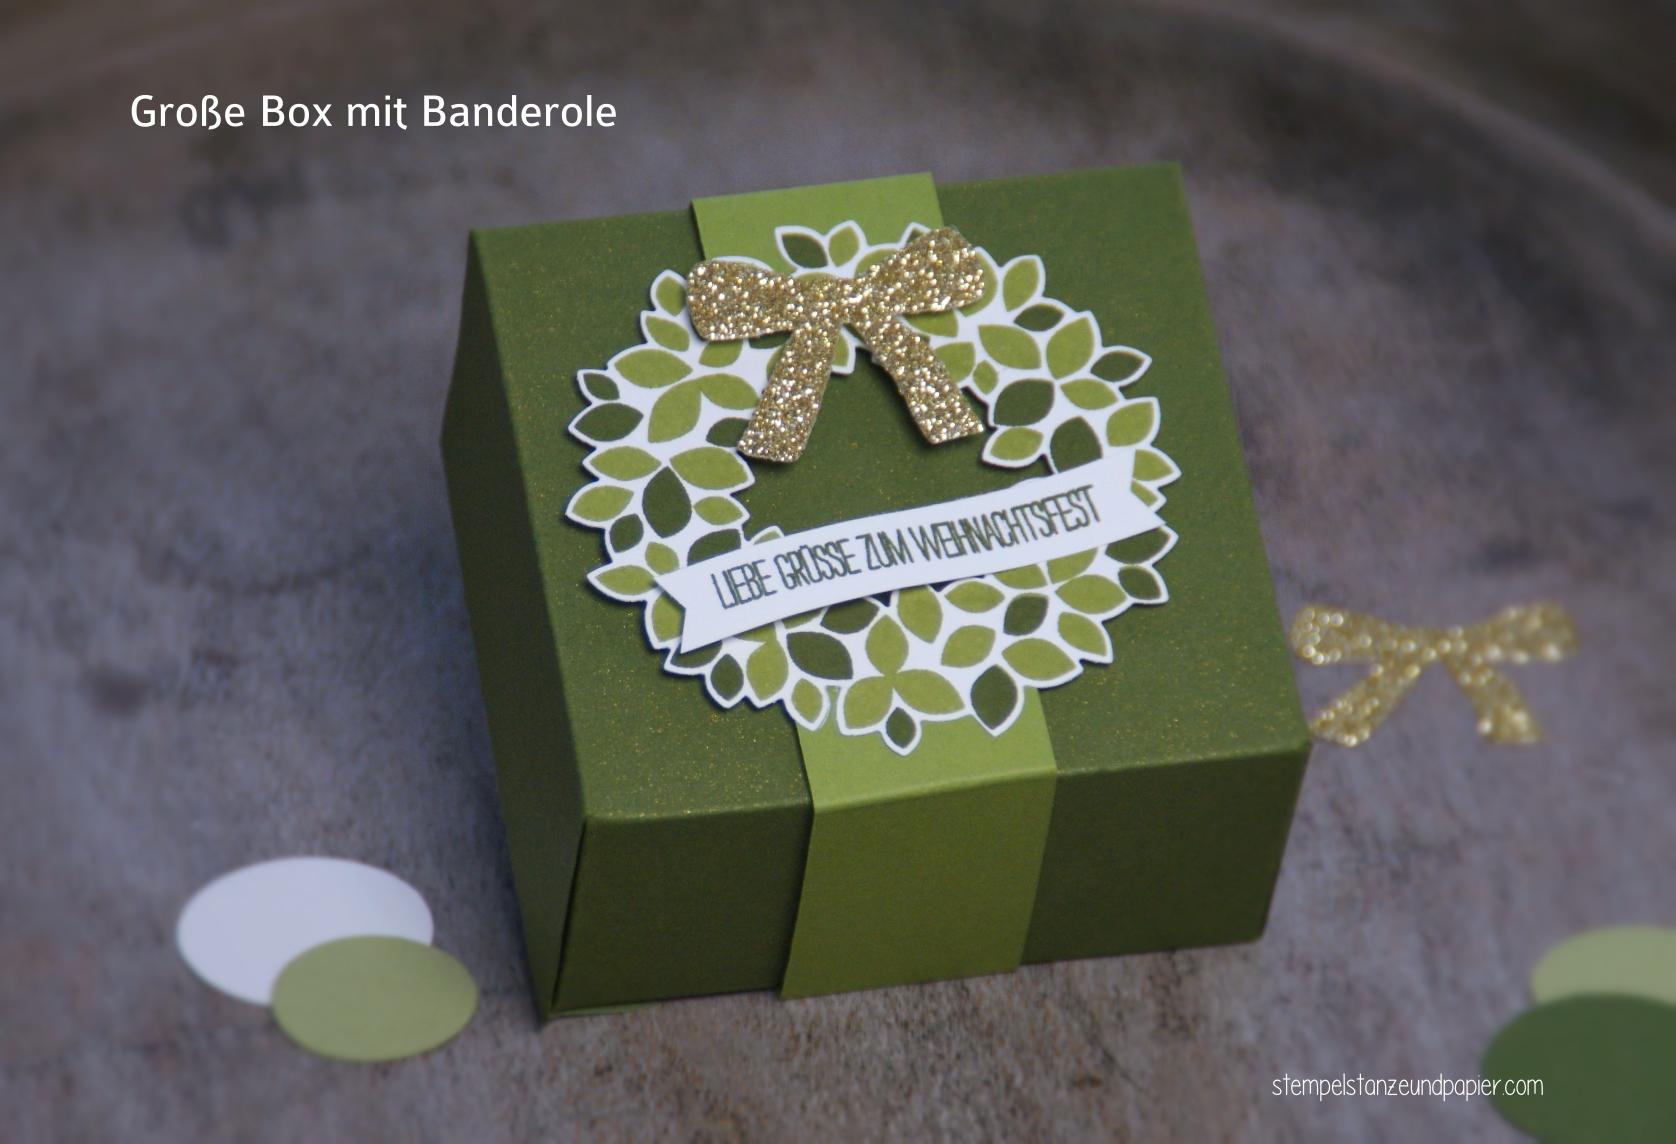 EPB WS box mit banderole